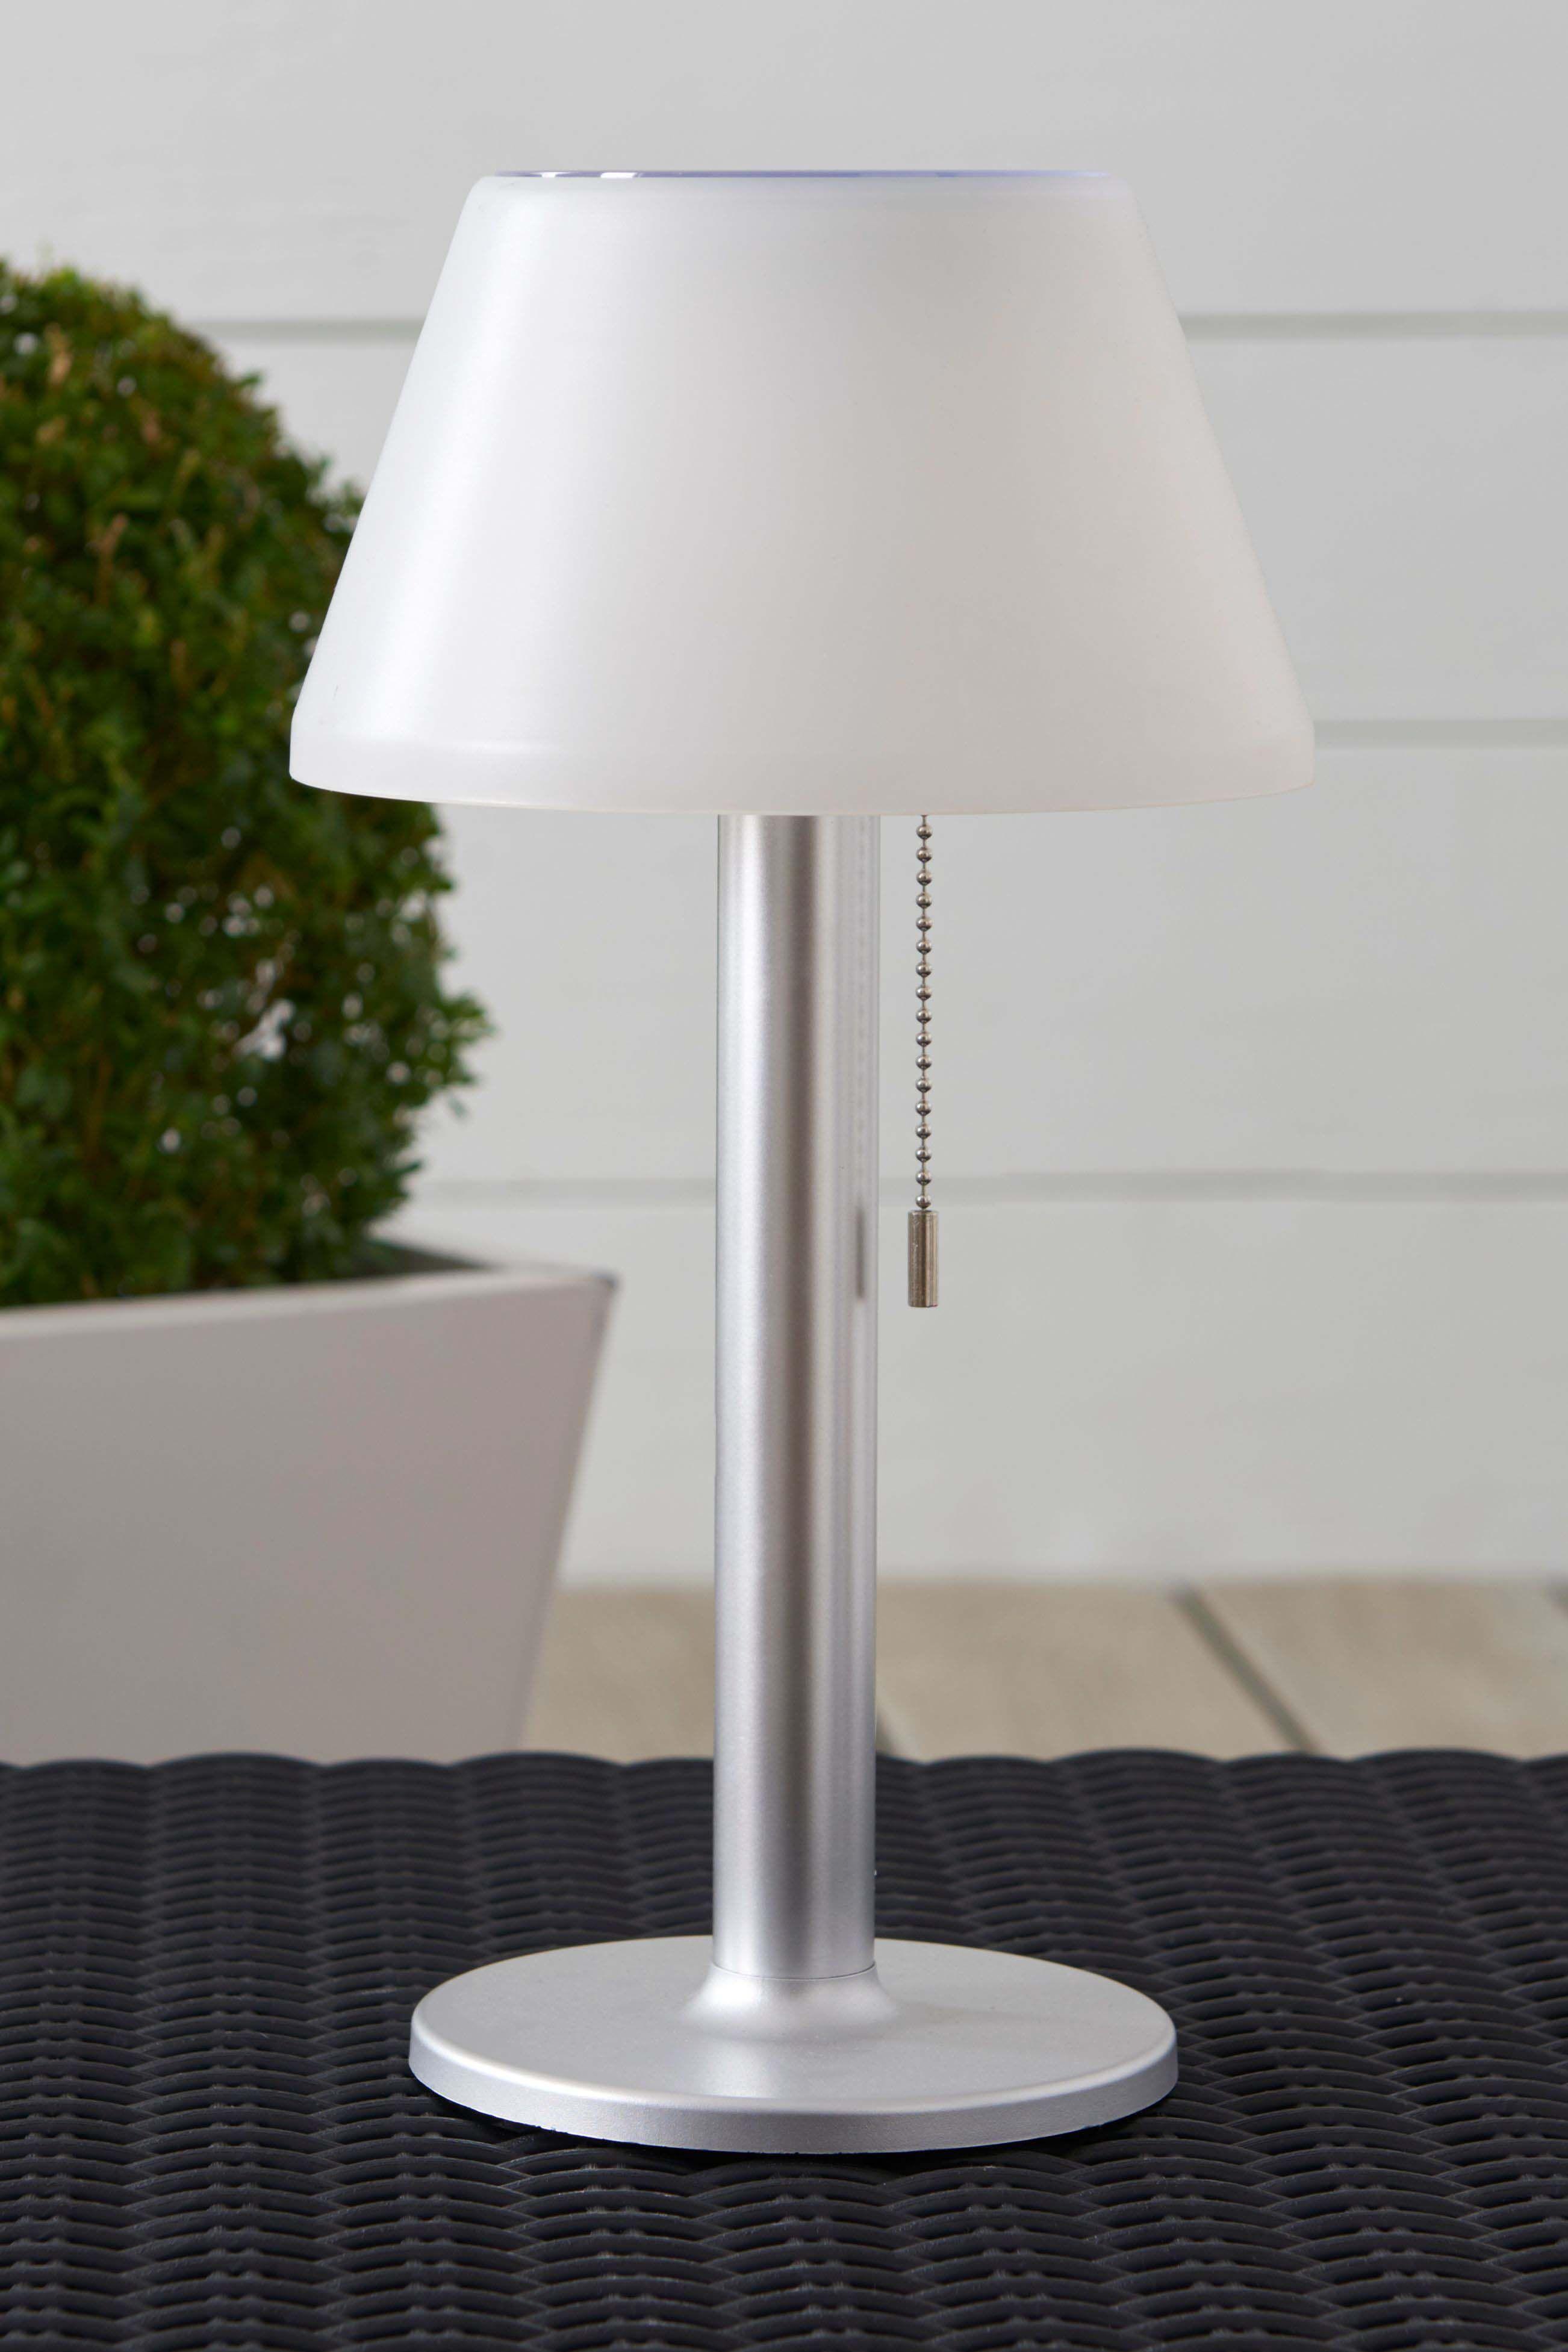 Next Solar Large White Table Lamp Silver White Table Lamp Table Lamp White Table